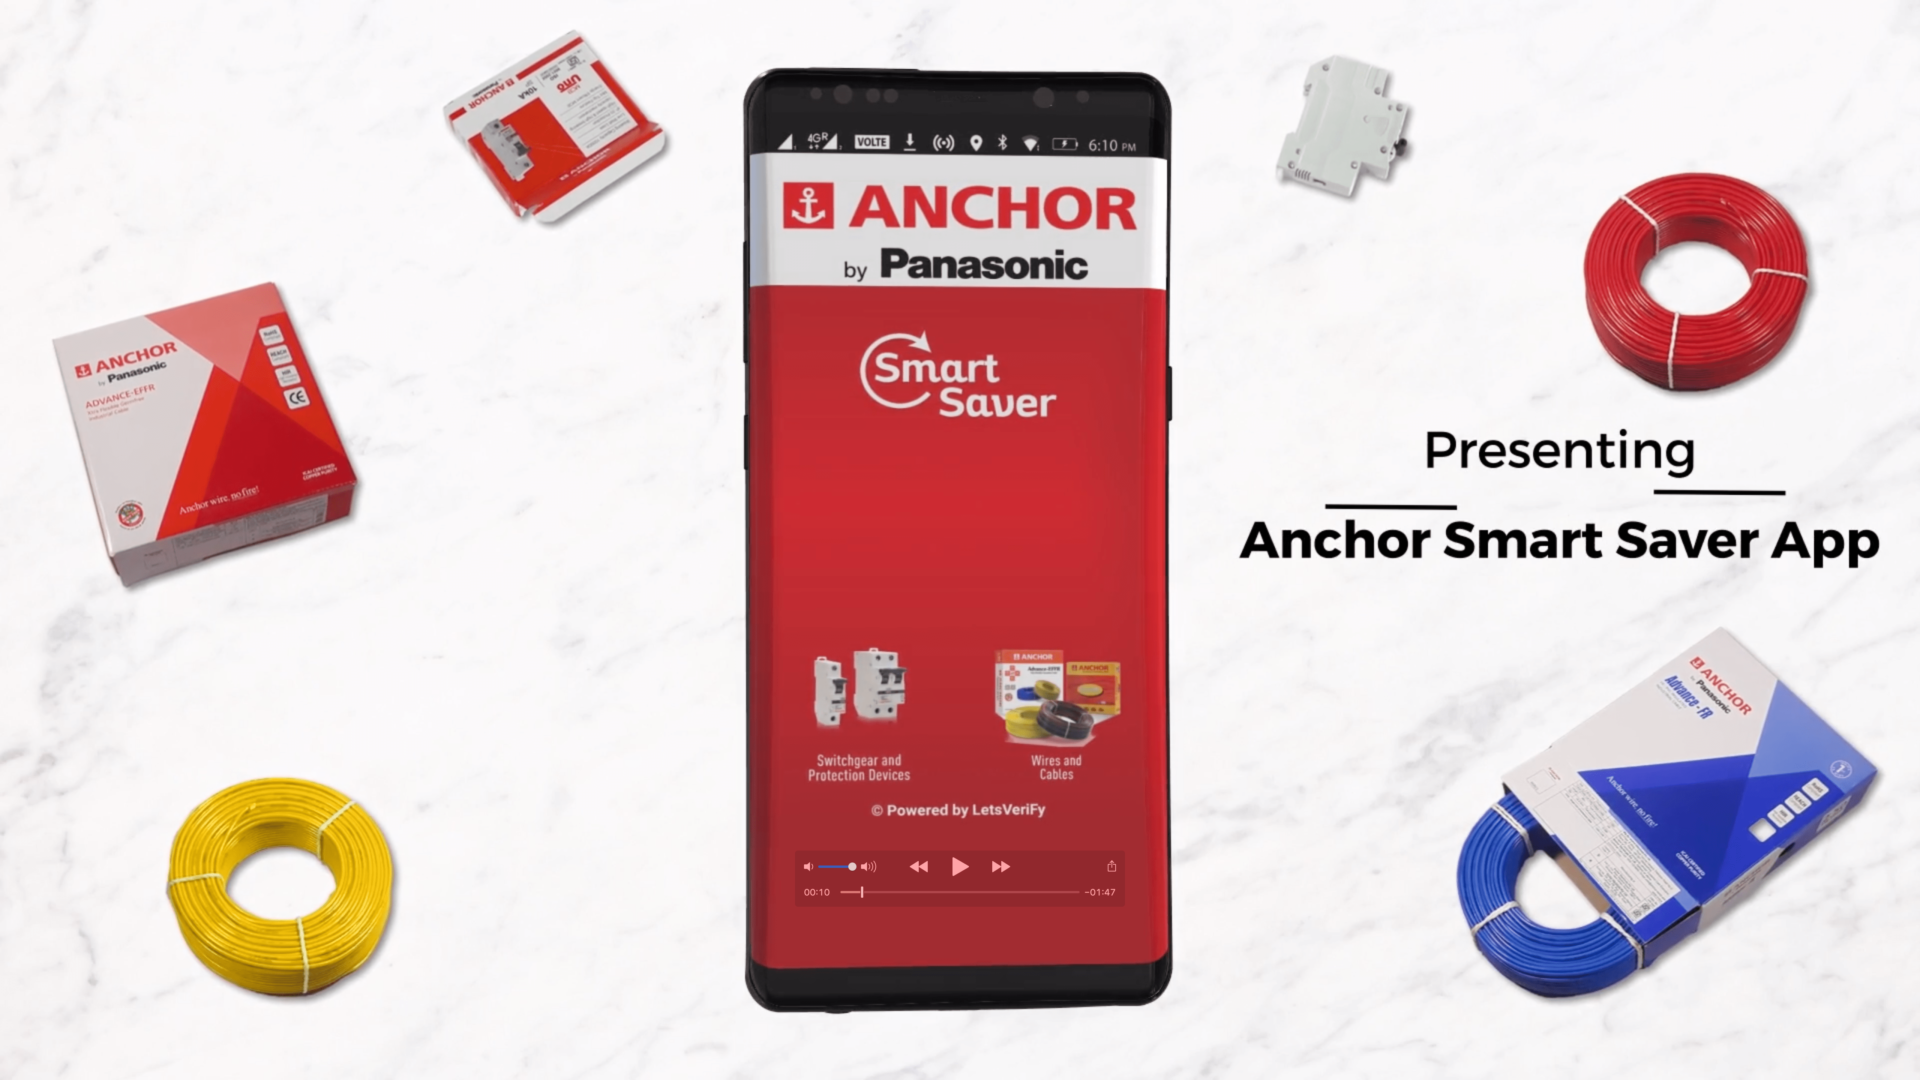 Anchor Smart Saver App - Explainer Video